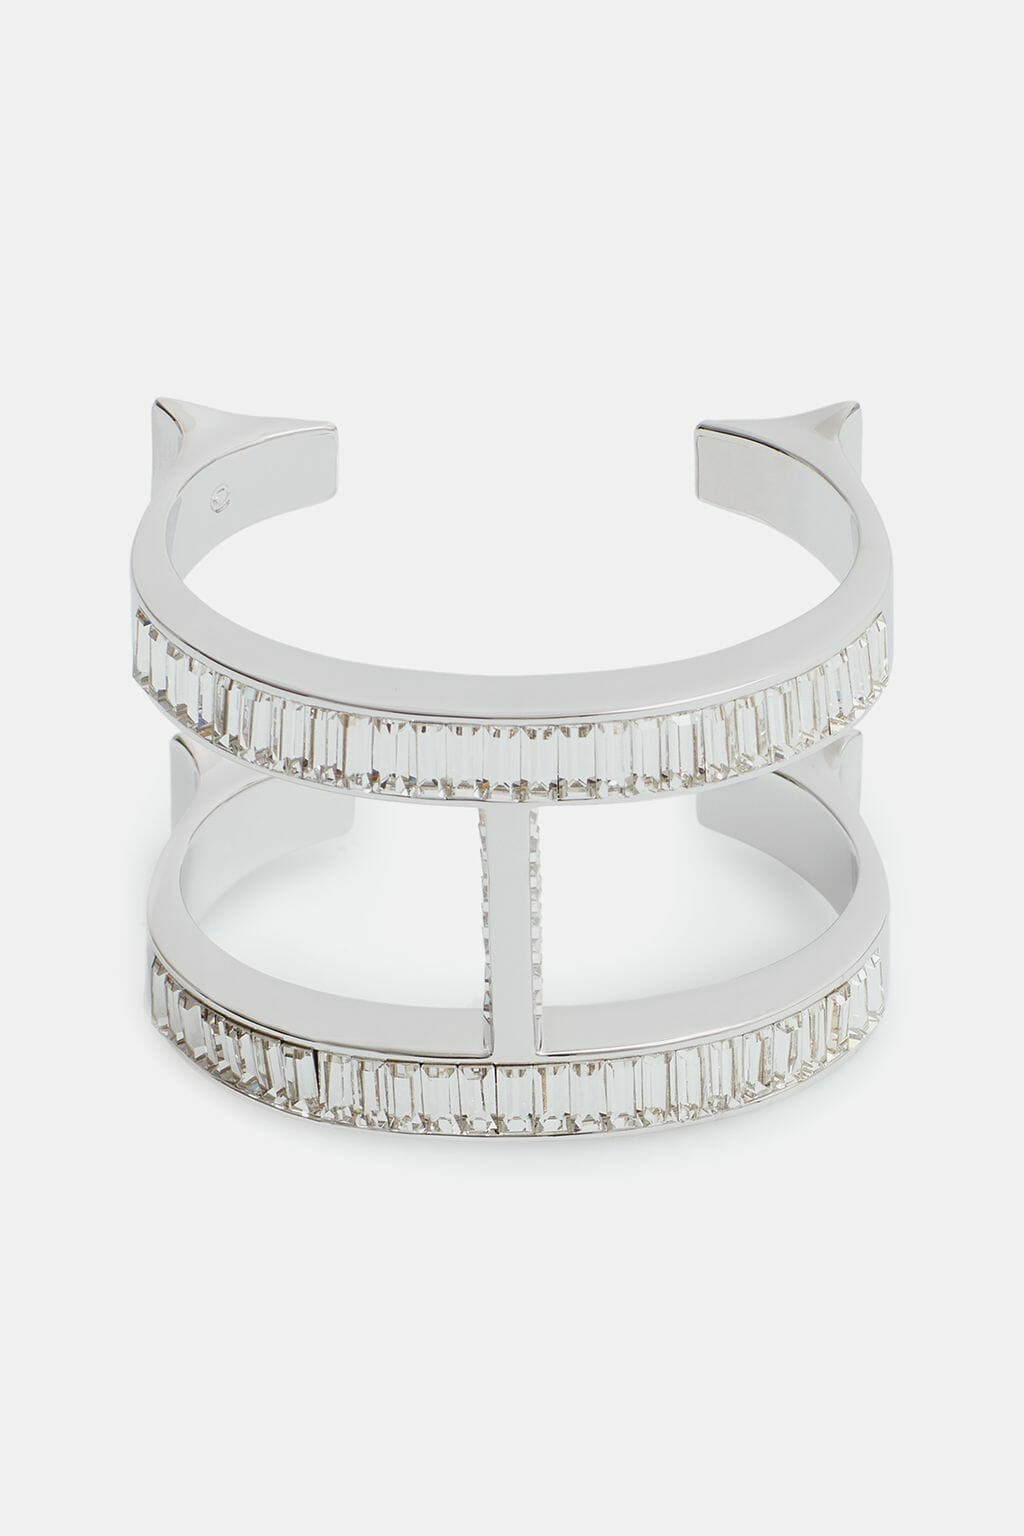 CH-Carolina-herrera-insignia-jewelry-look-11